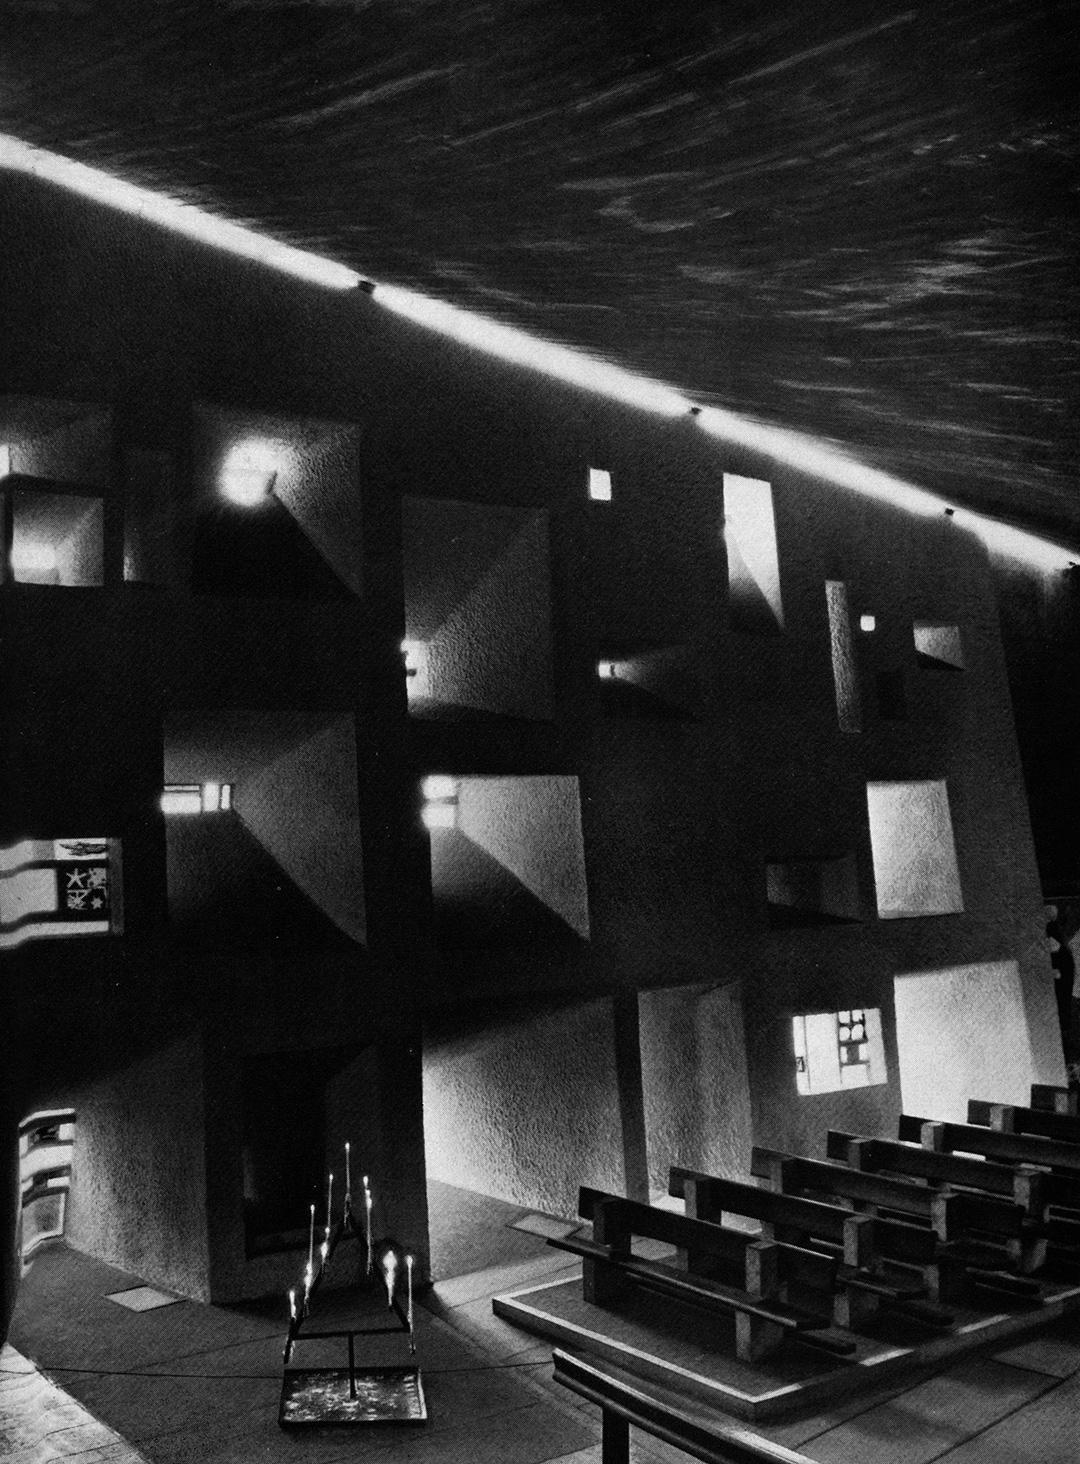 17 obras de le corbusier son ya patrimonio mundial metalocus - Arquitecto le corbusier ...